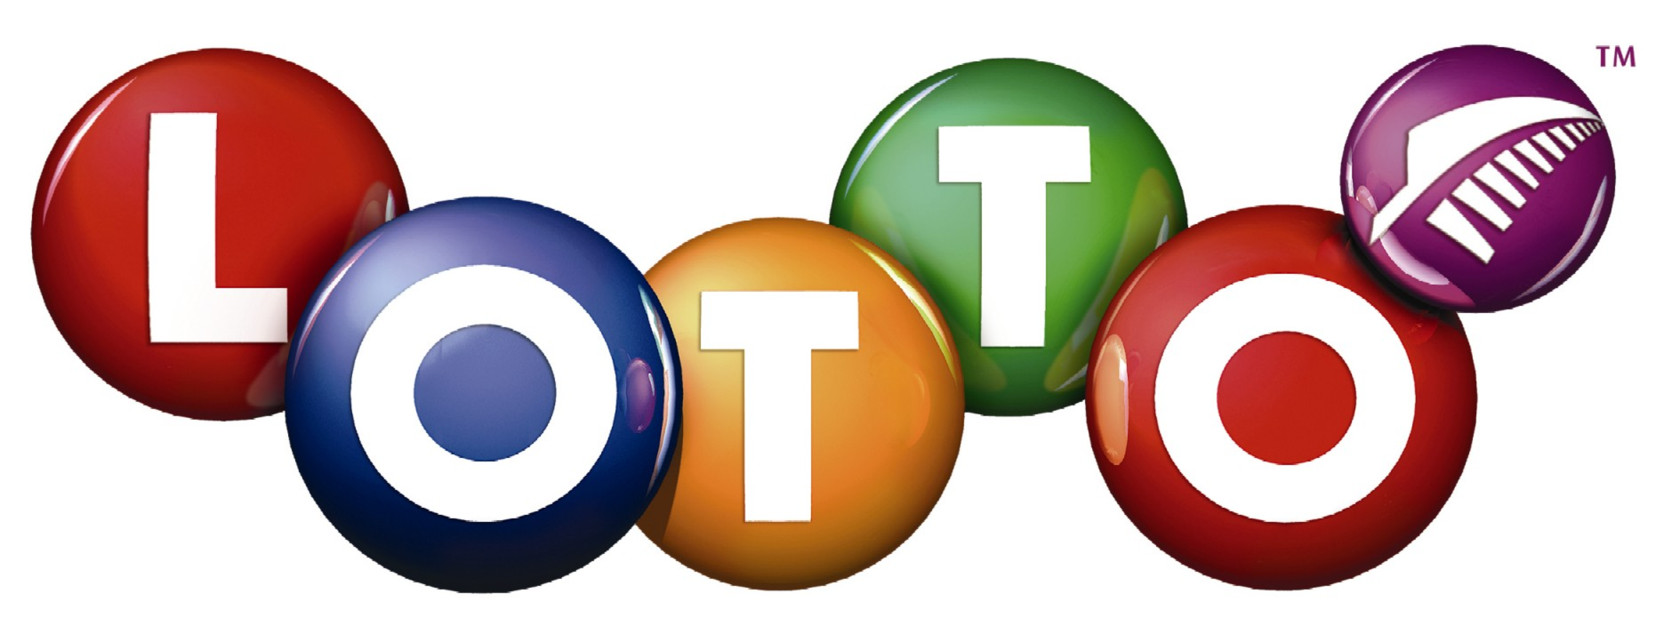 Lotto. vinti a Terracina 450.000 euro. Anxur Time